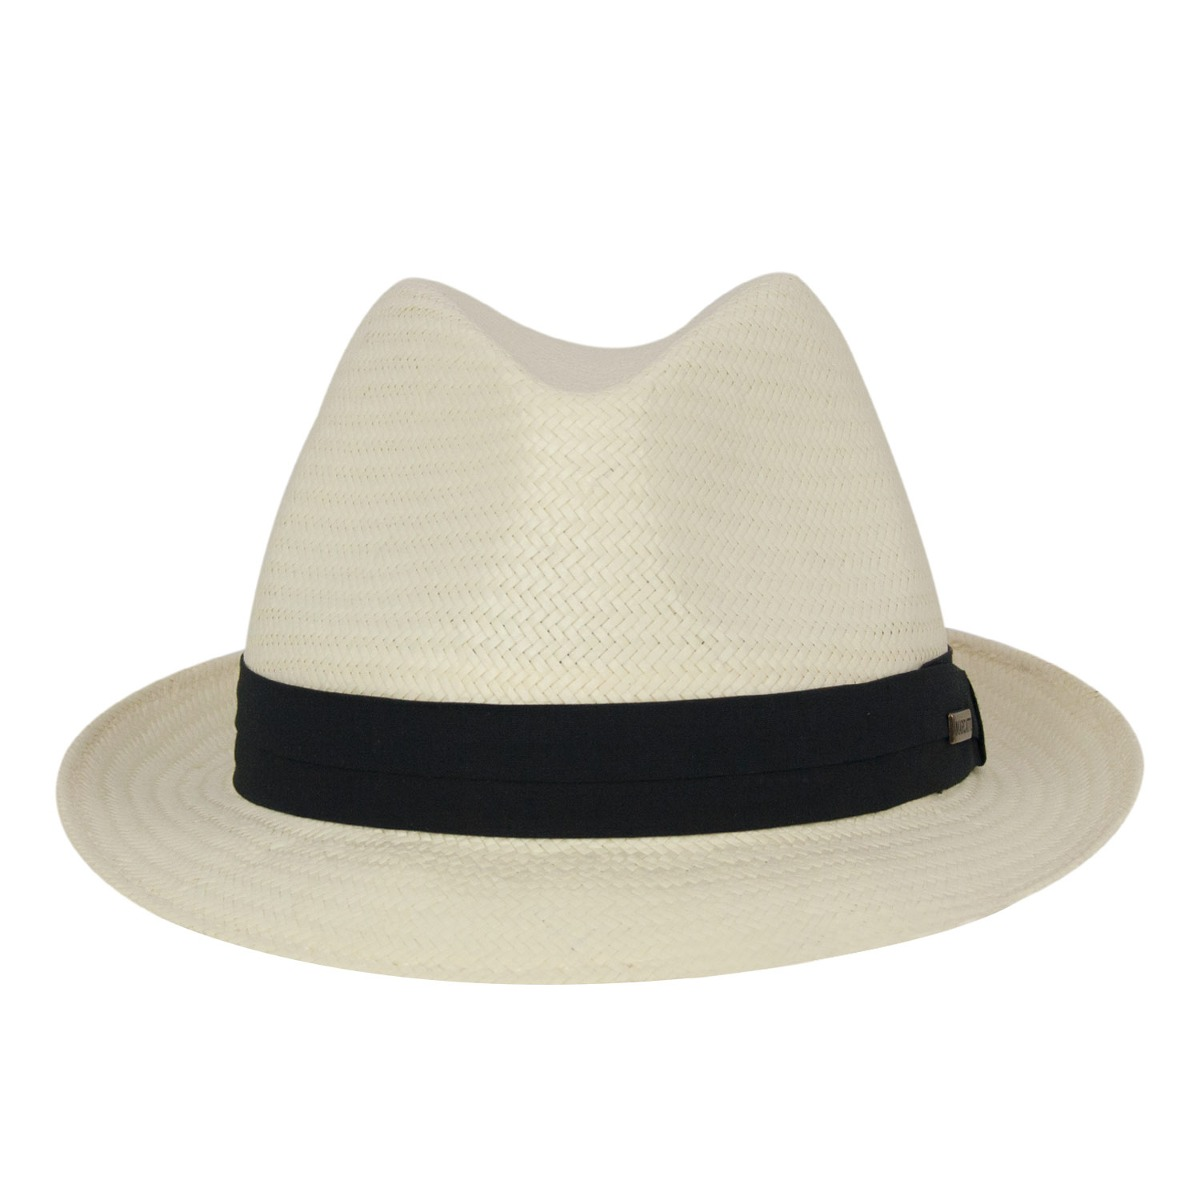 chapéu palha aba curta marcatto-marfim-tamanho 56. Carregando zoom. 0f0f89a0517